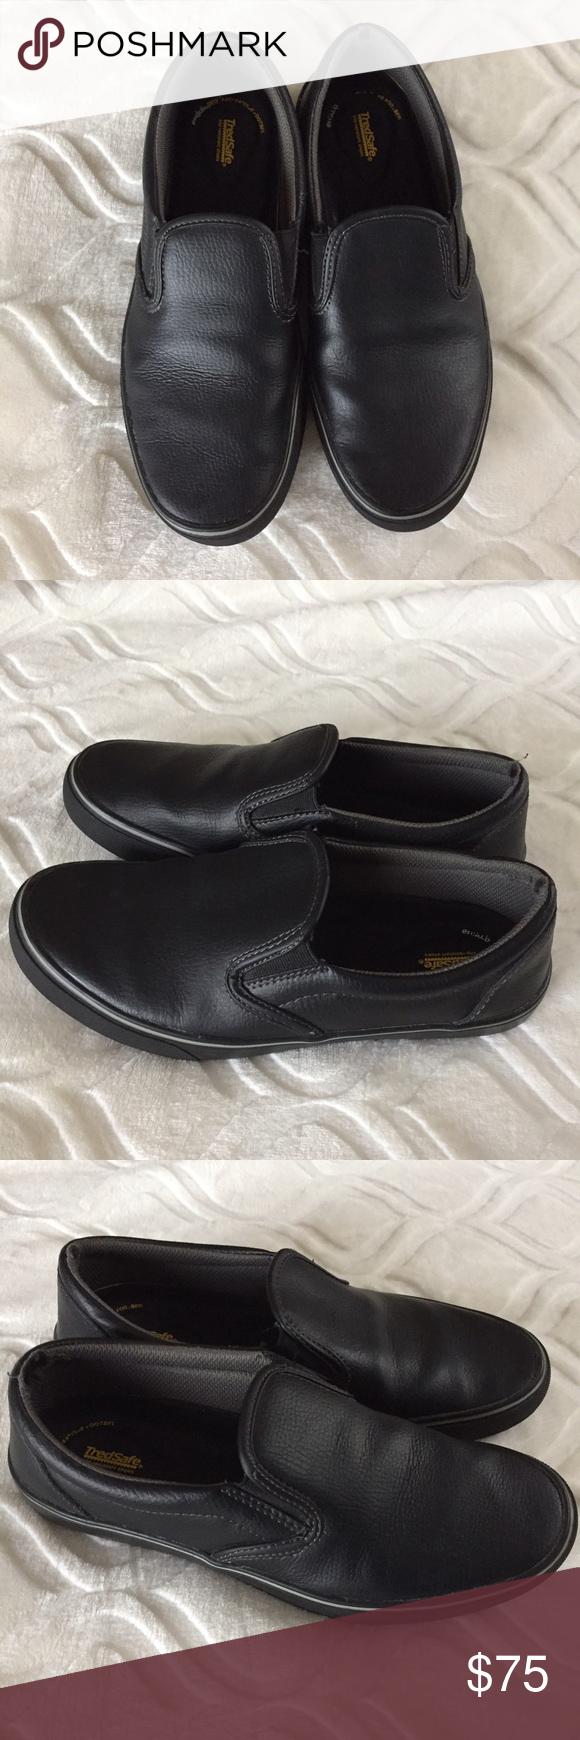 Black shiny slip on non slip work shoes